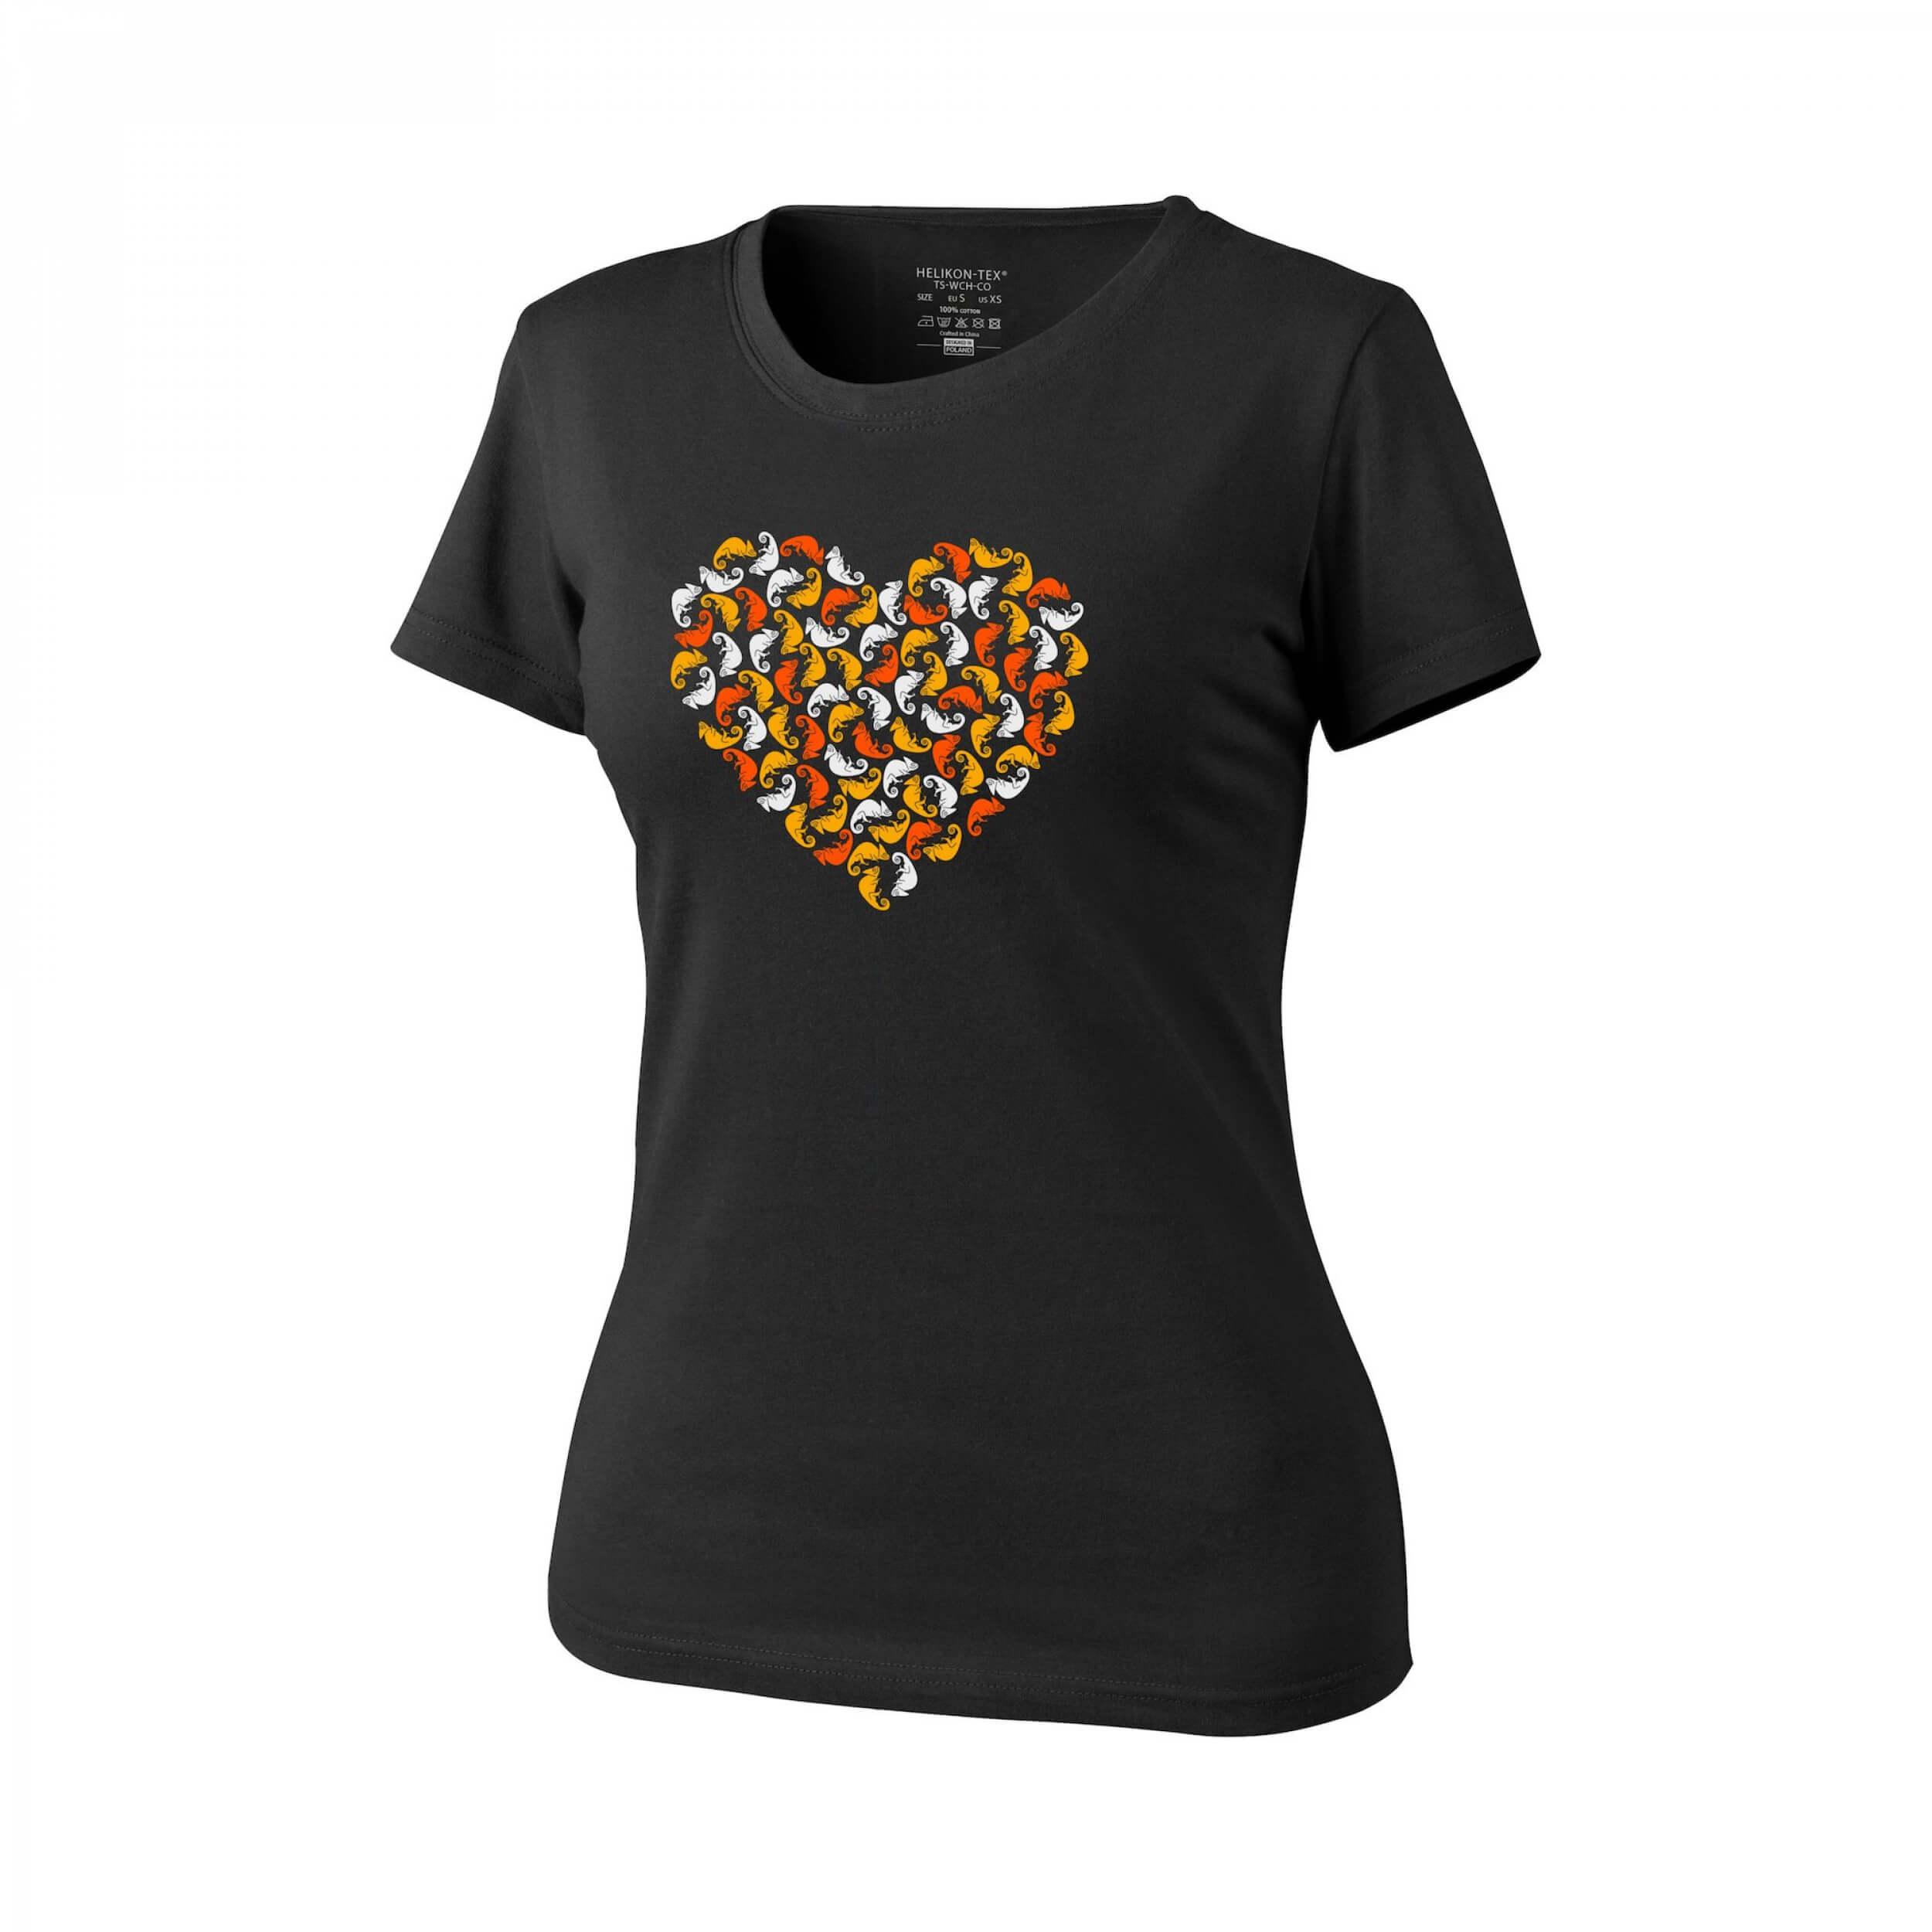 Helikon-Tex WOMEN'S T-Shirt (Chameleon Heart) -Cotton- Black